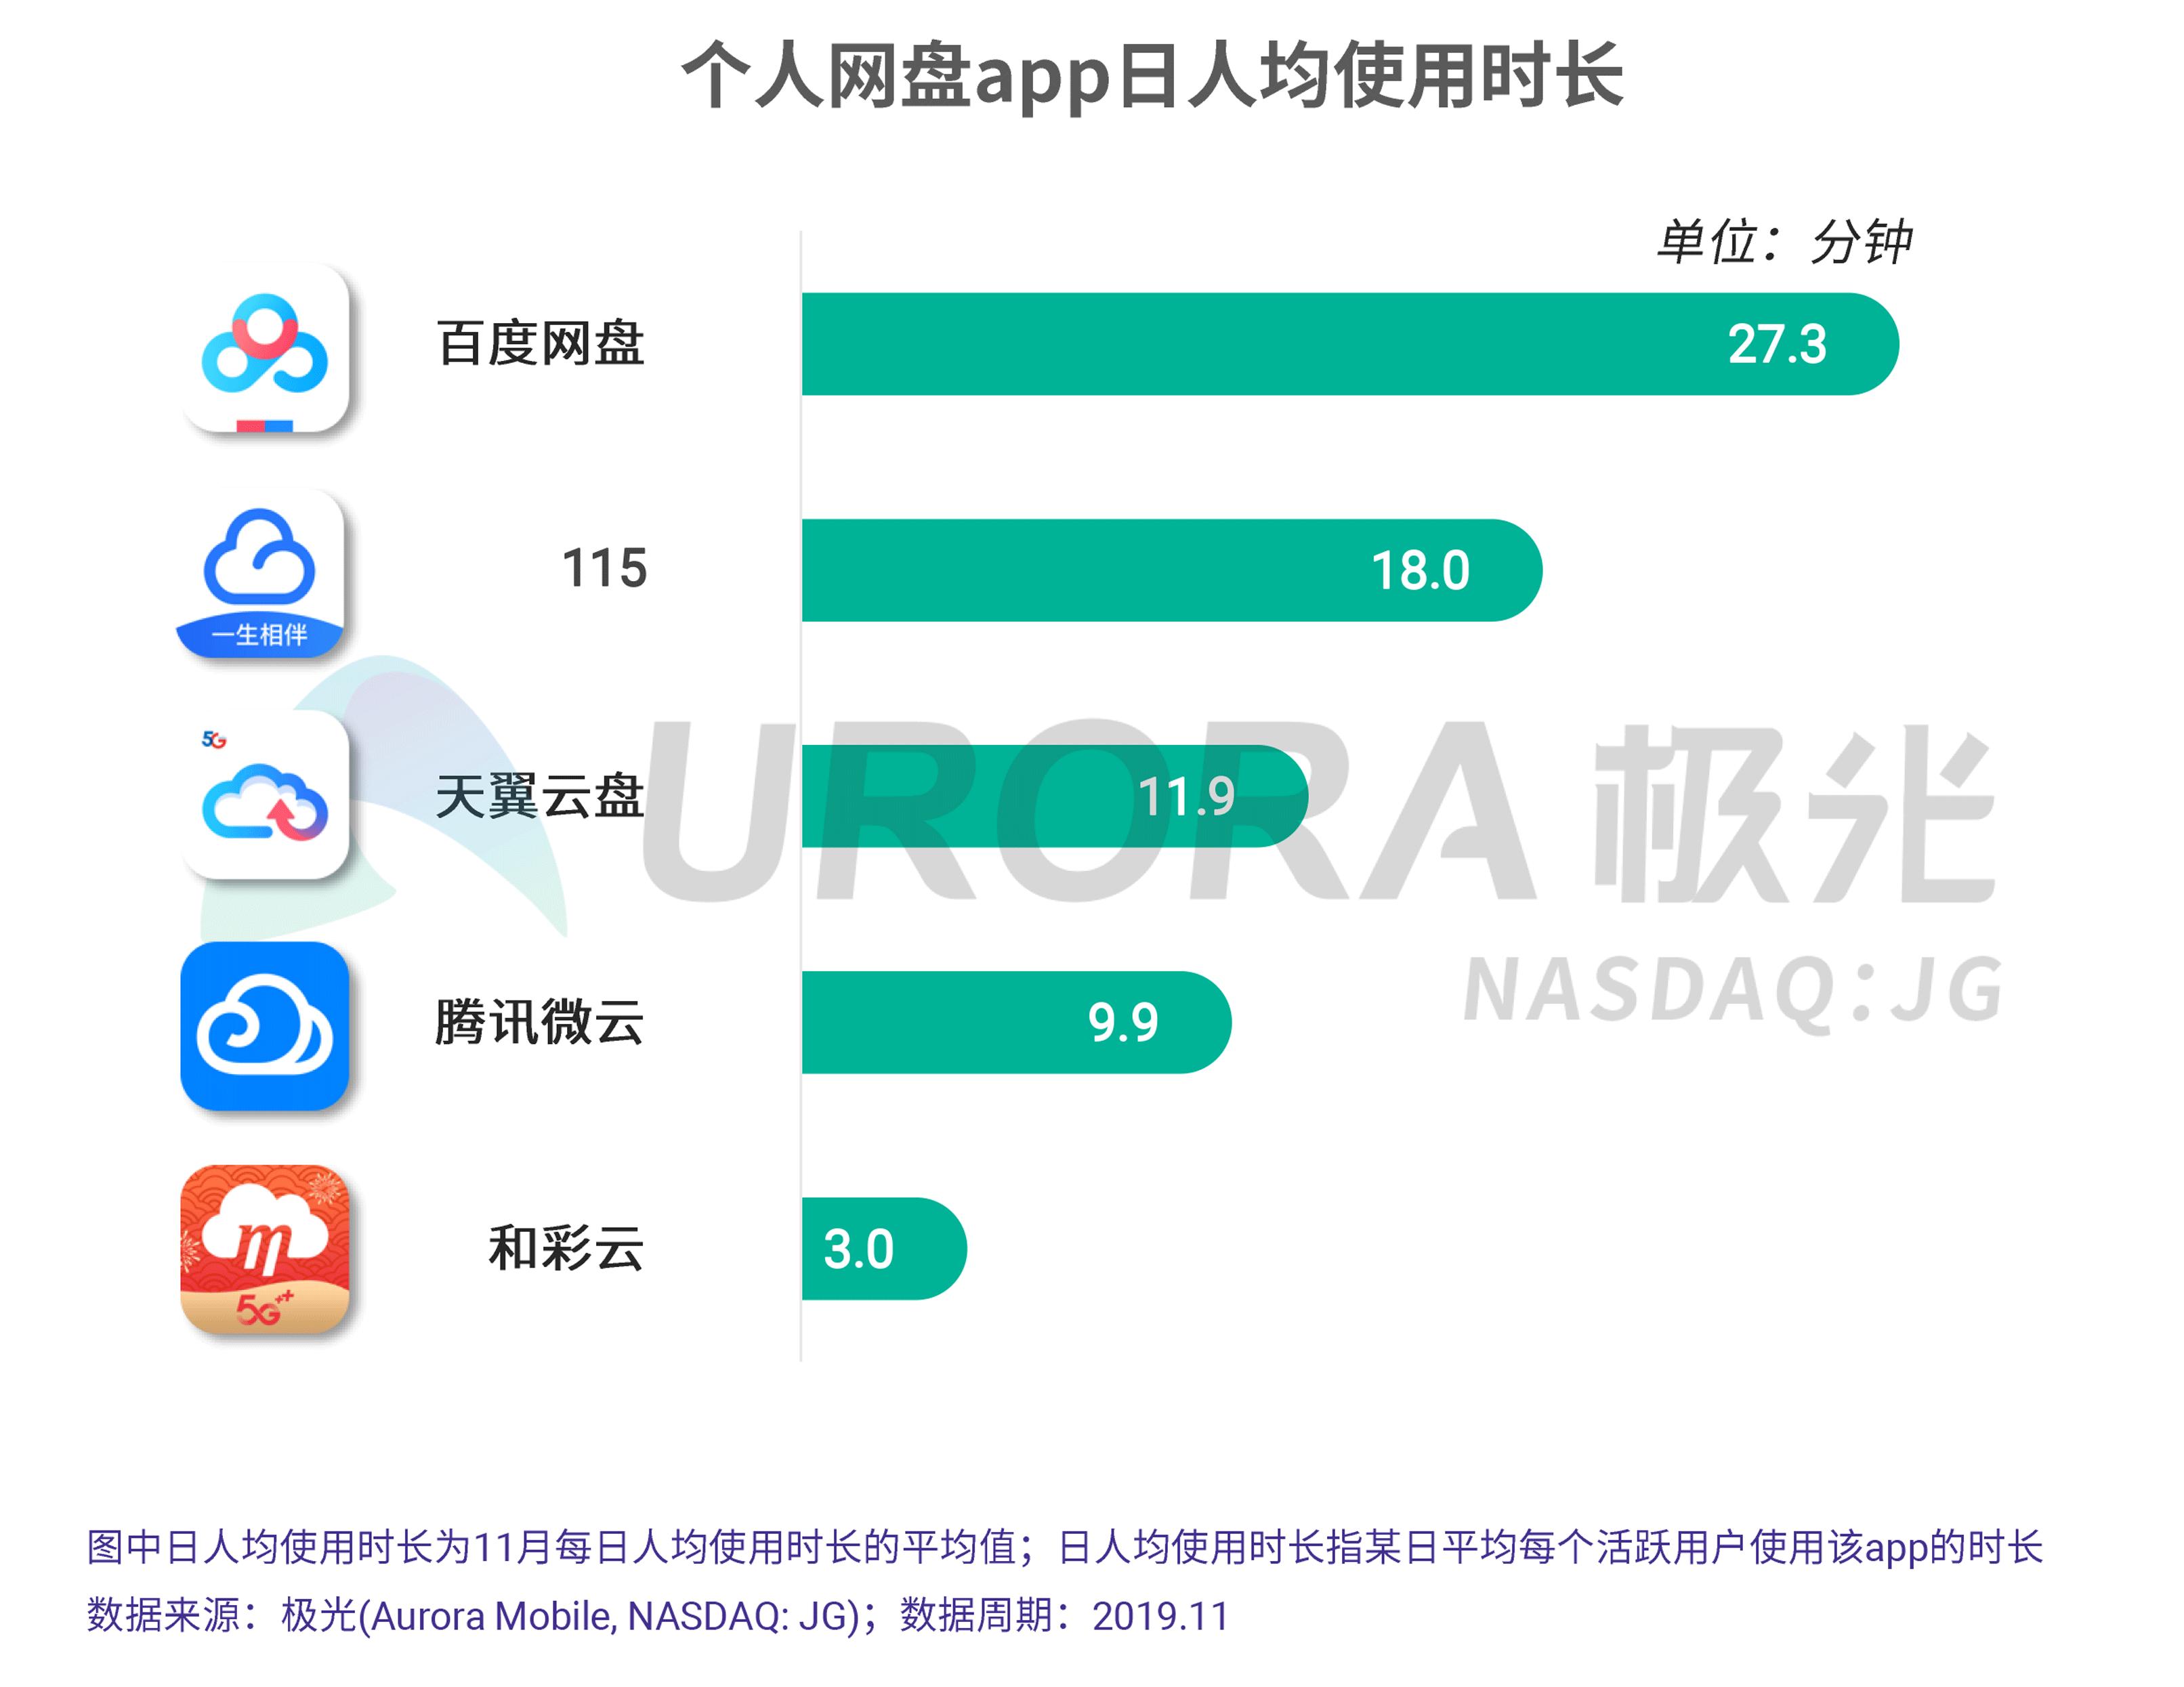 JIGUANG-个人网盘行业研究报告-final---切图版2-18.png